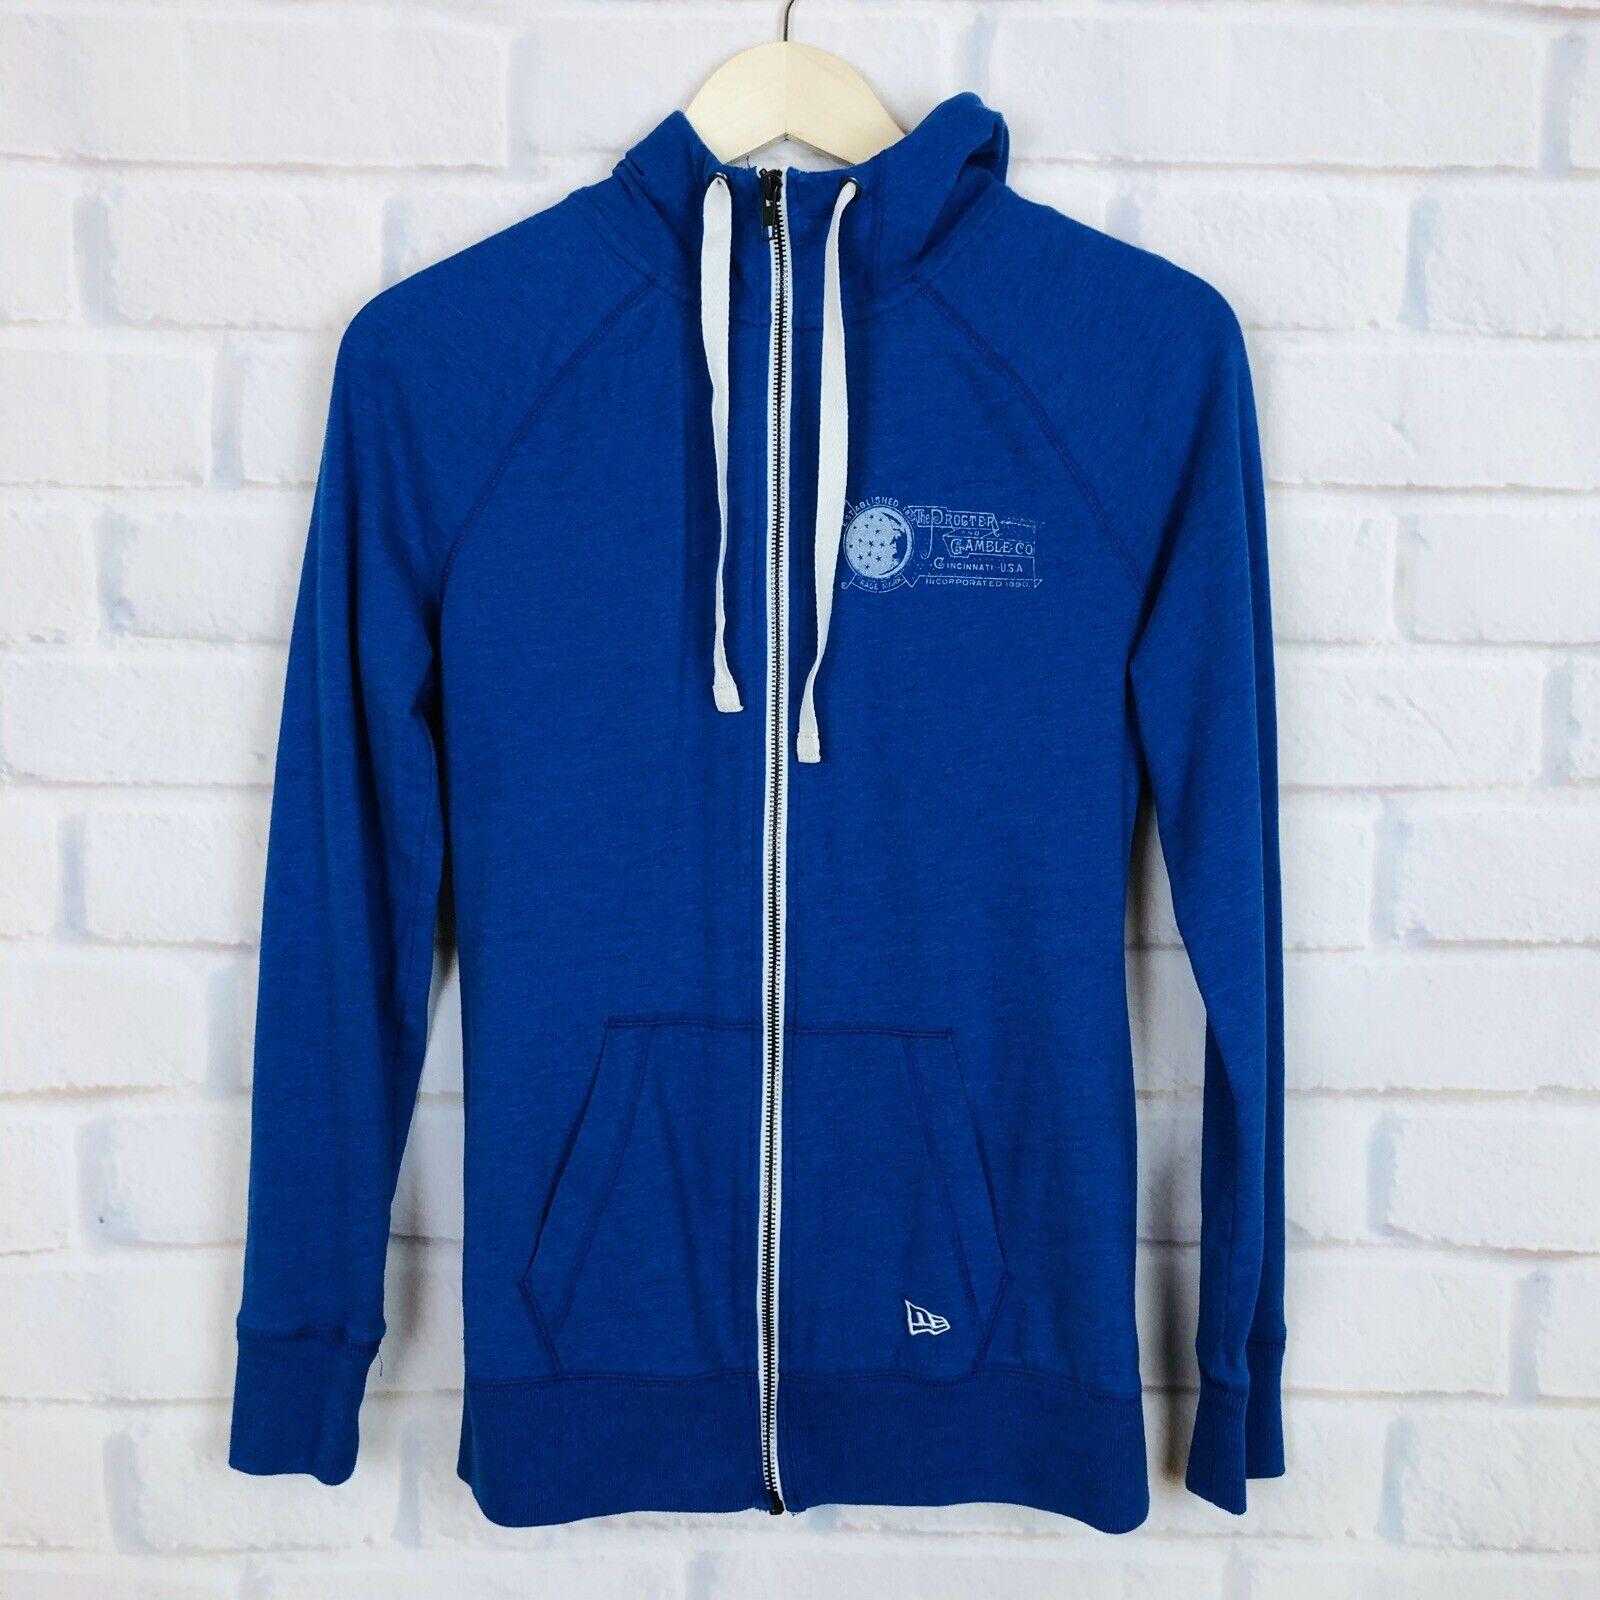 New Era Womens Size S Blue Drawstring Hoodie Full Zip Proctor & Gamble Logo Top